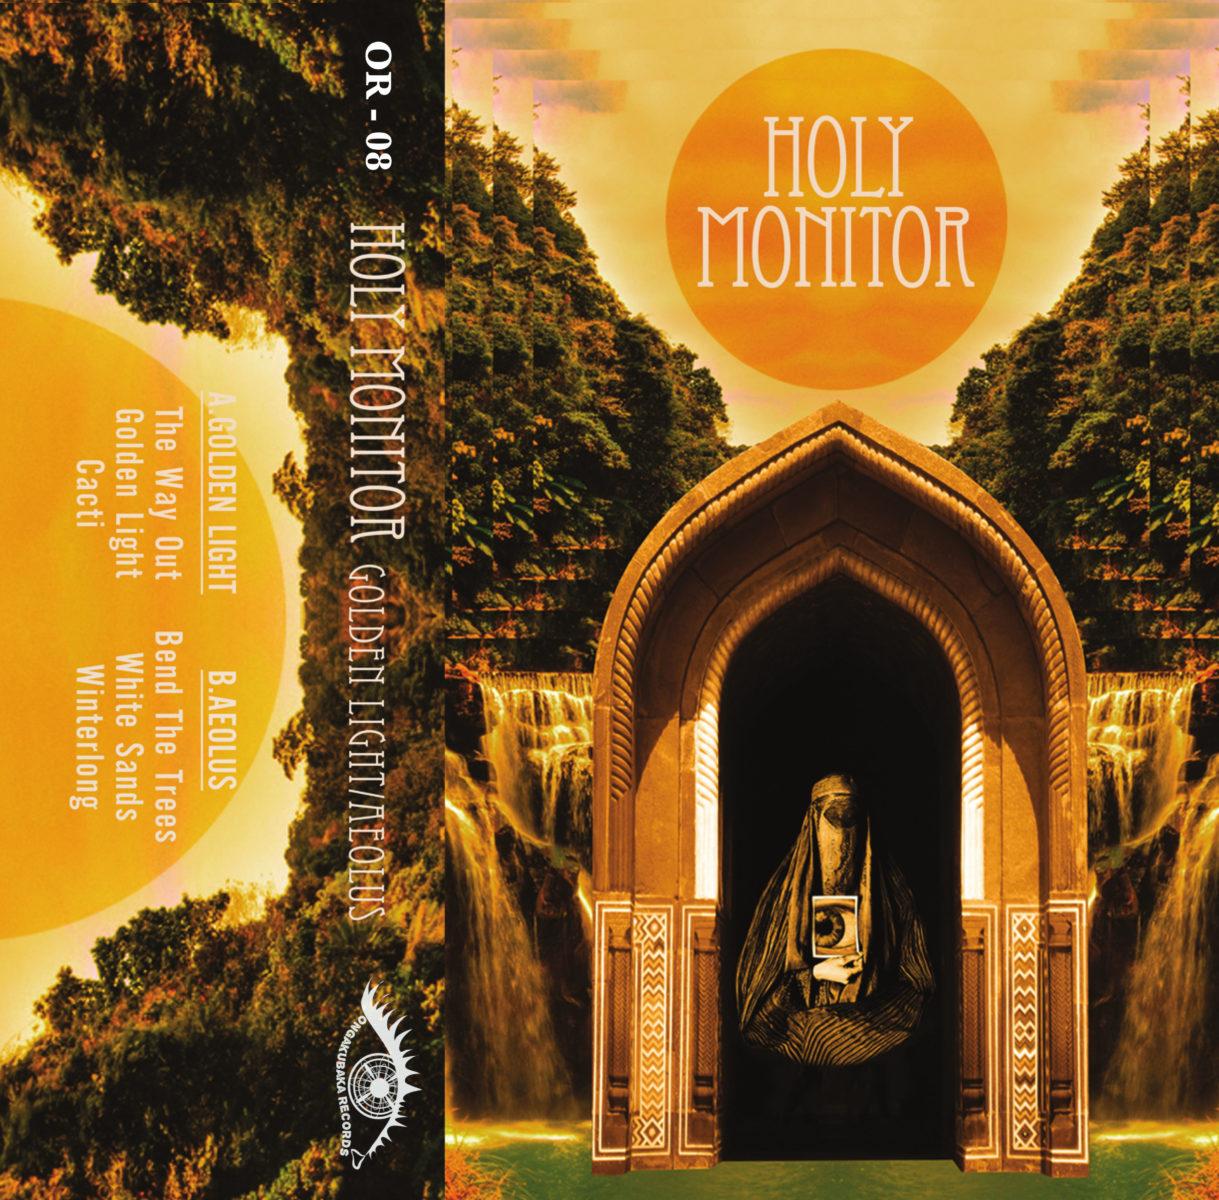 Holy Monitor | Golden Light/Aeolus | 3hive.com